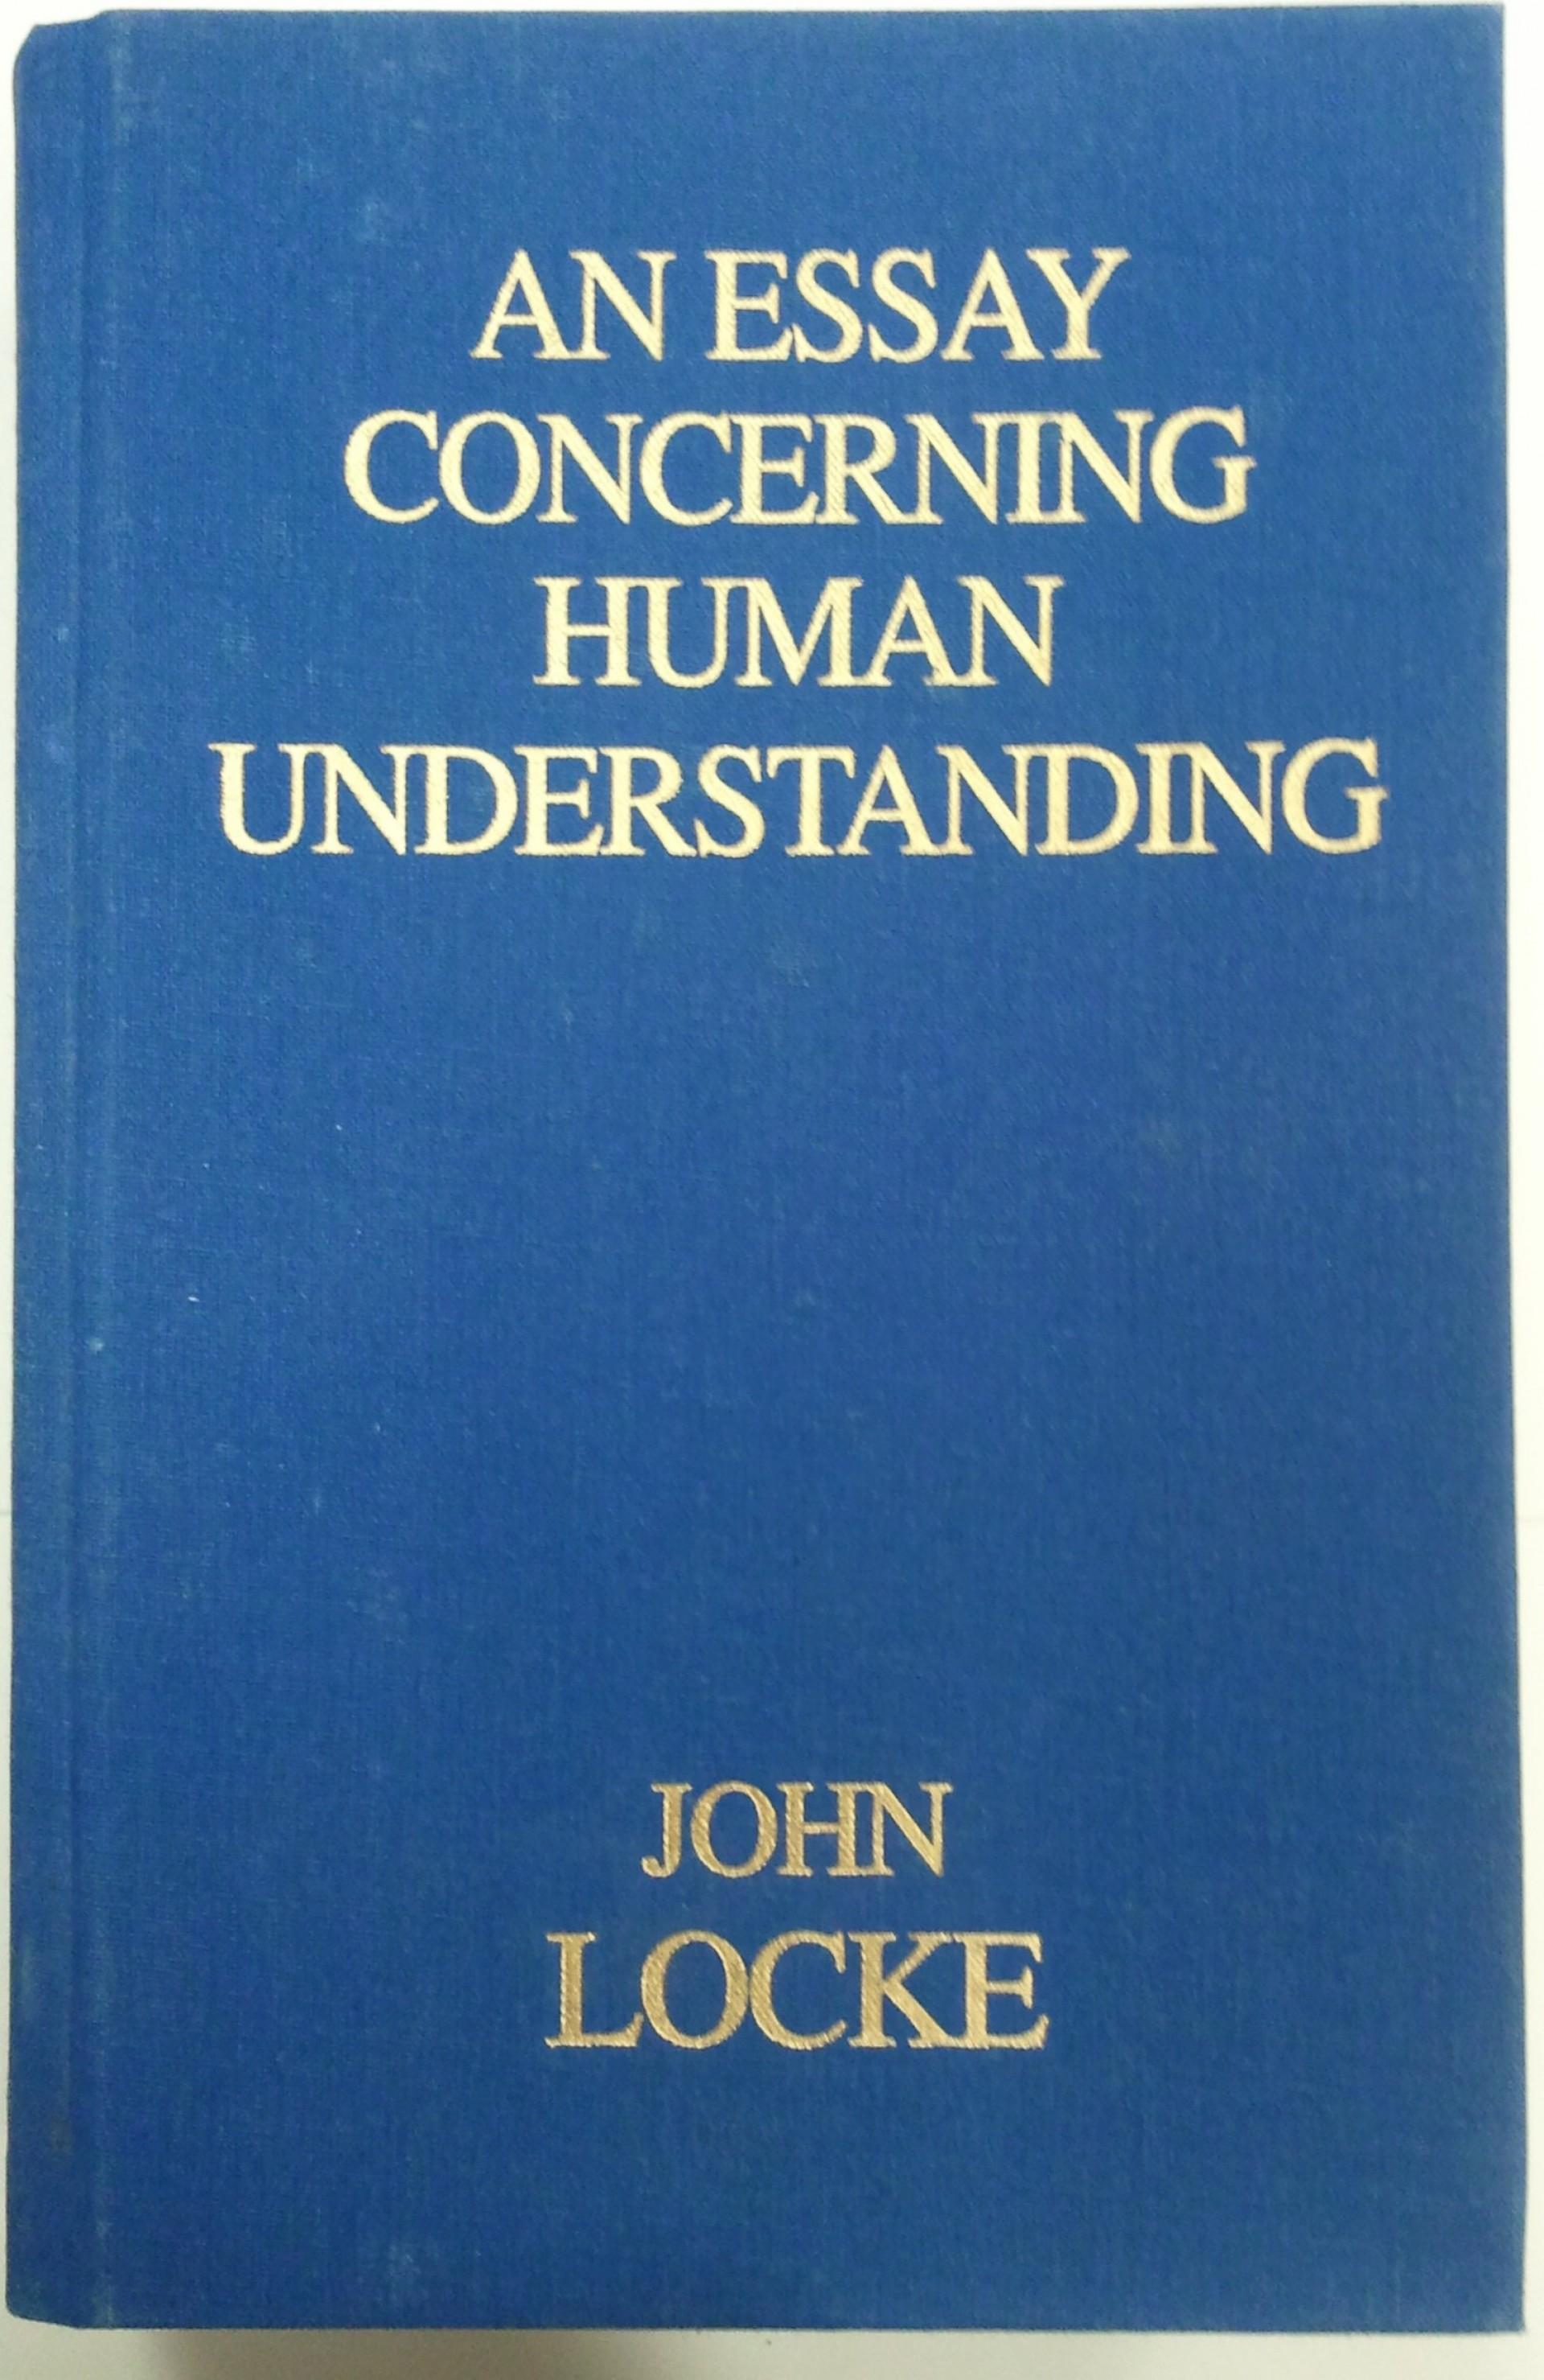 008 John Locke Essay Example Impressive Concerning Human Understanding Book 4 On Pdf Summary 1920